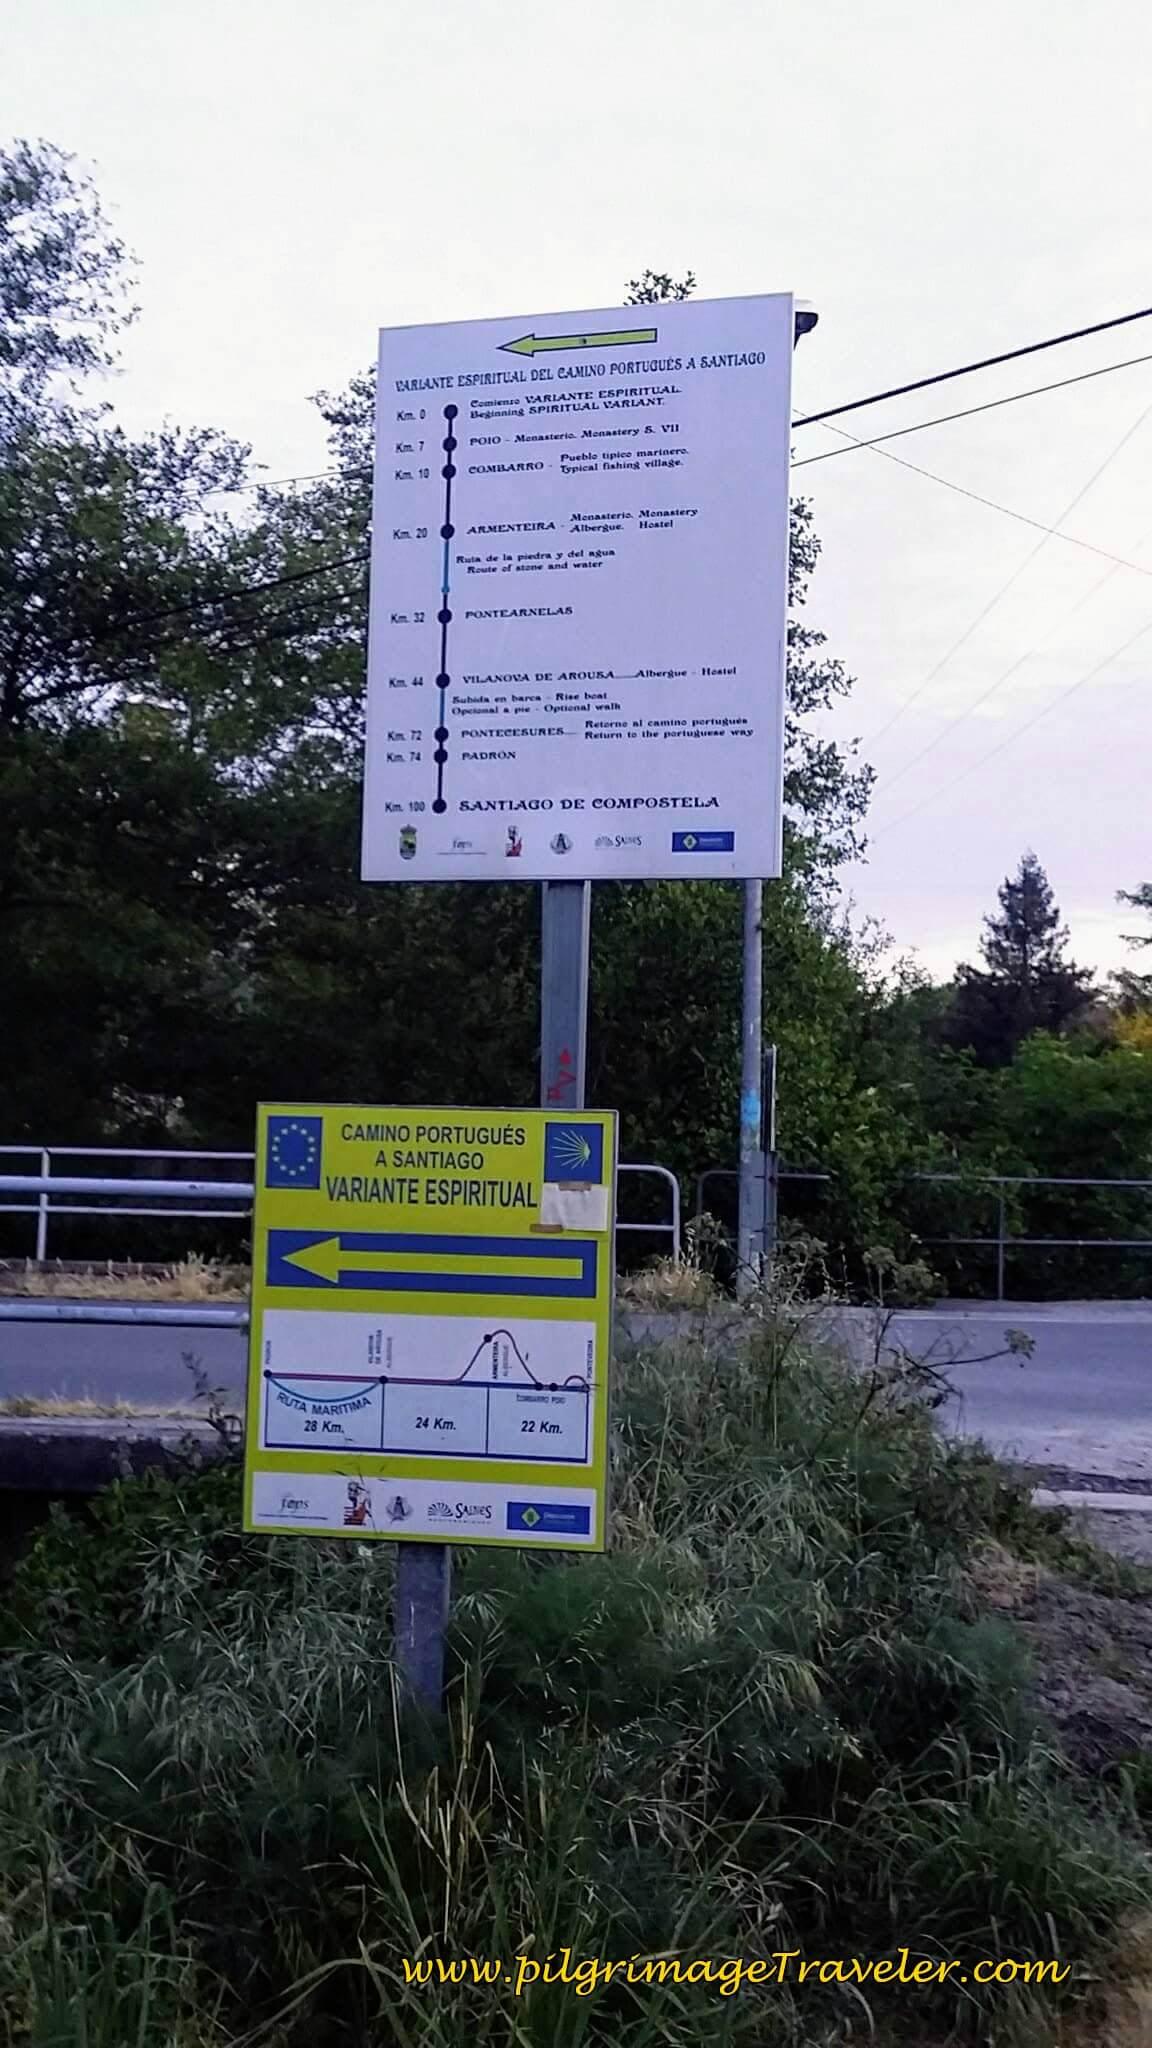 Turn Here for the Variante Espiritual on day twenty-three, Camino Portugués